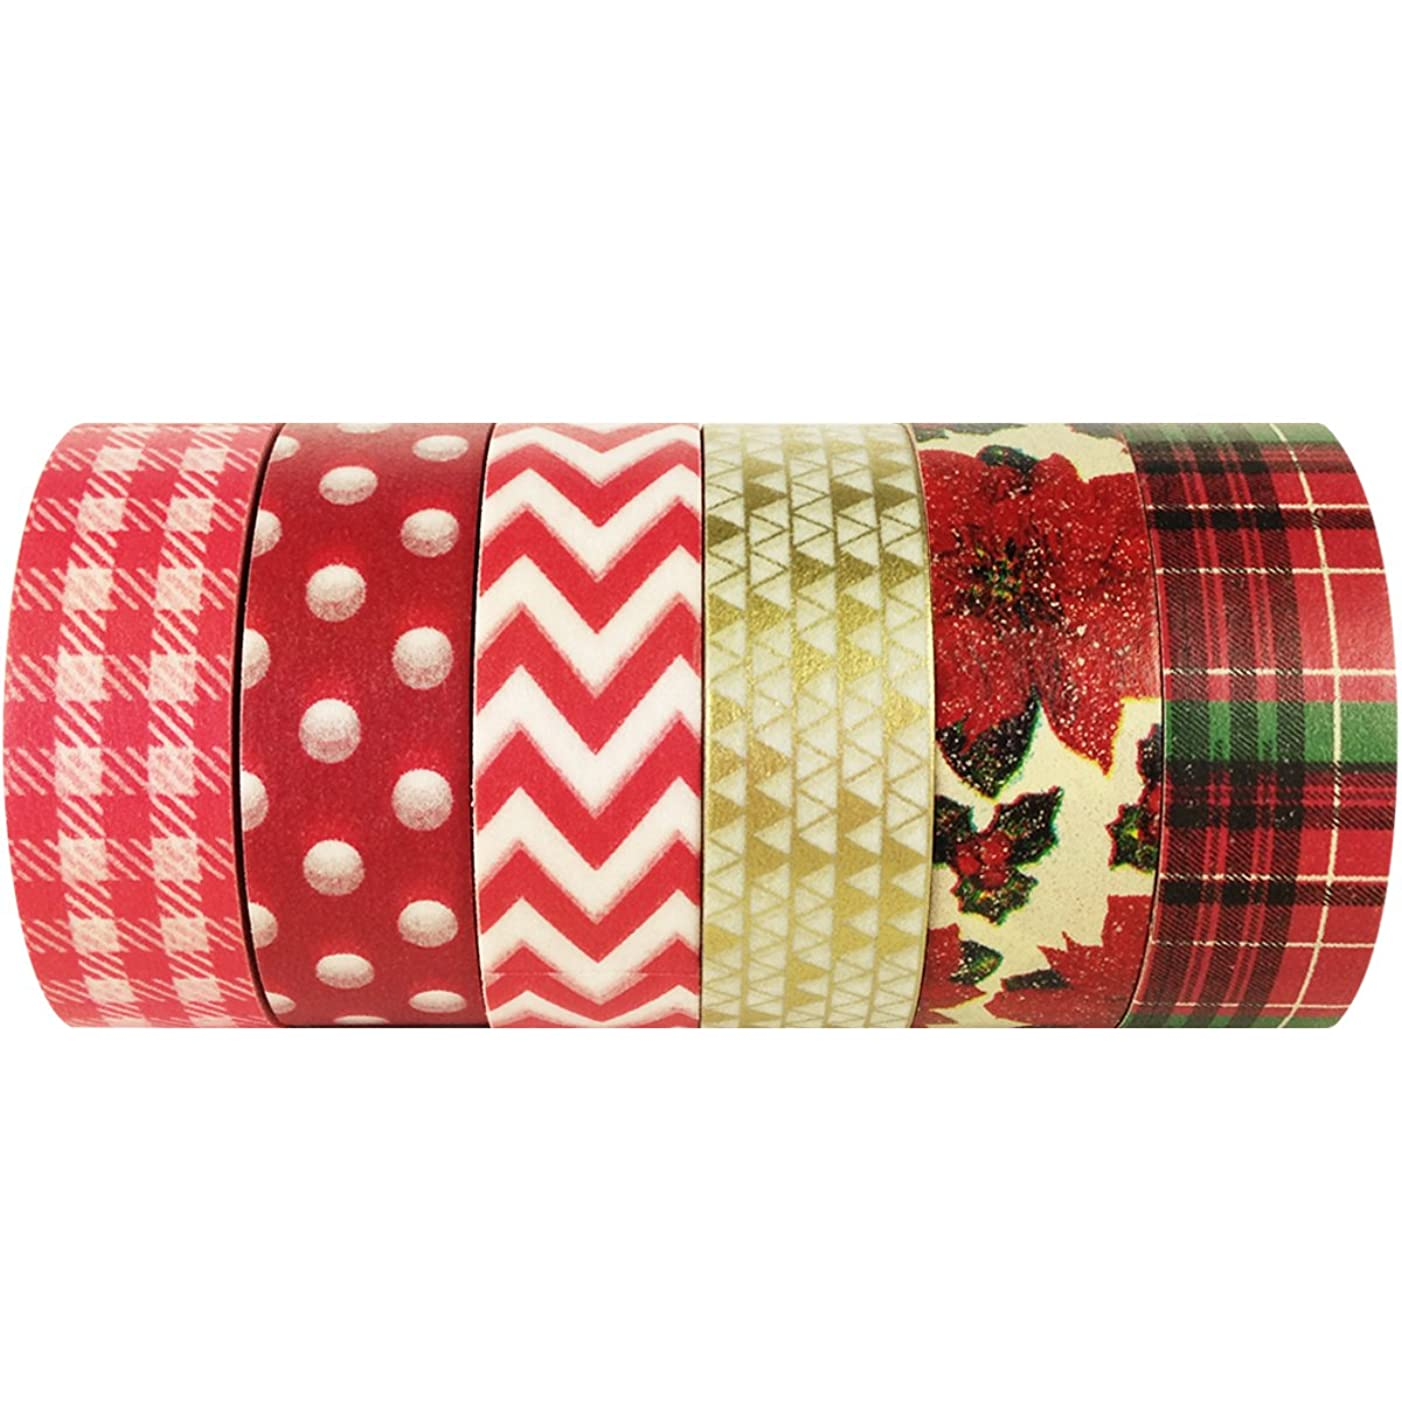 ALLYDREW Red Poinsetta Washi Tape Rolls Decorative Masking Tapes Set - 6 Rolls